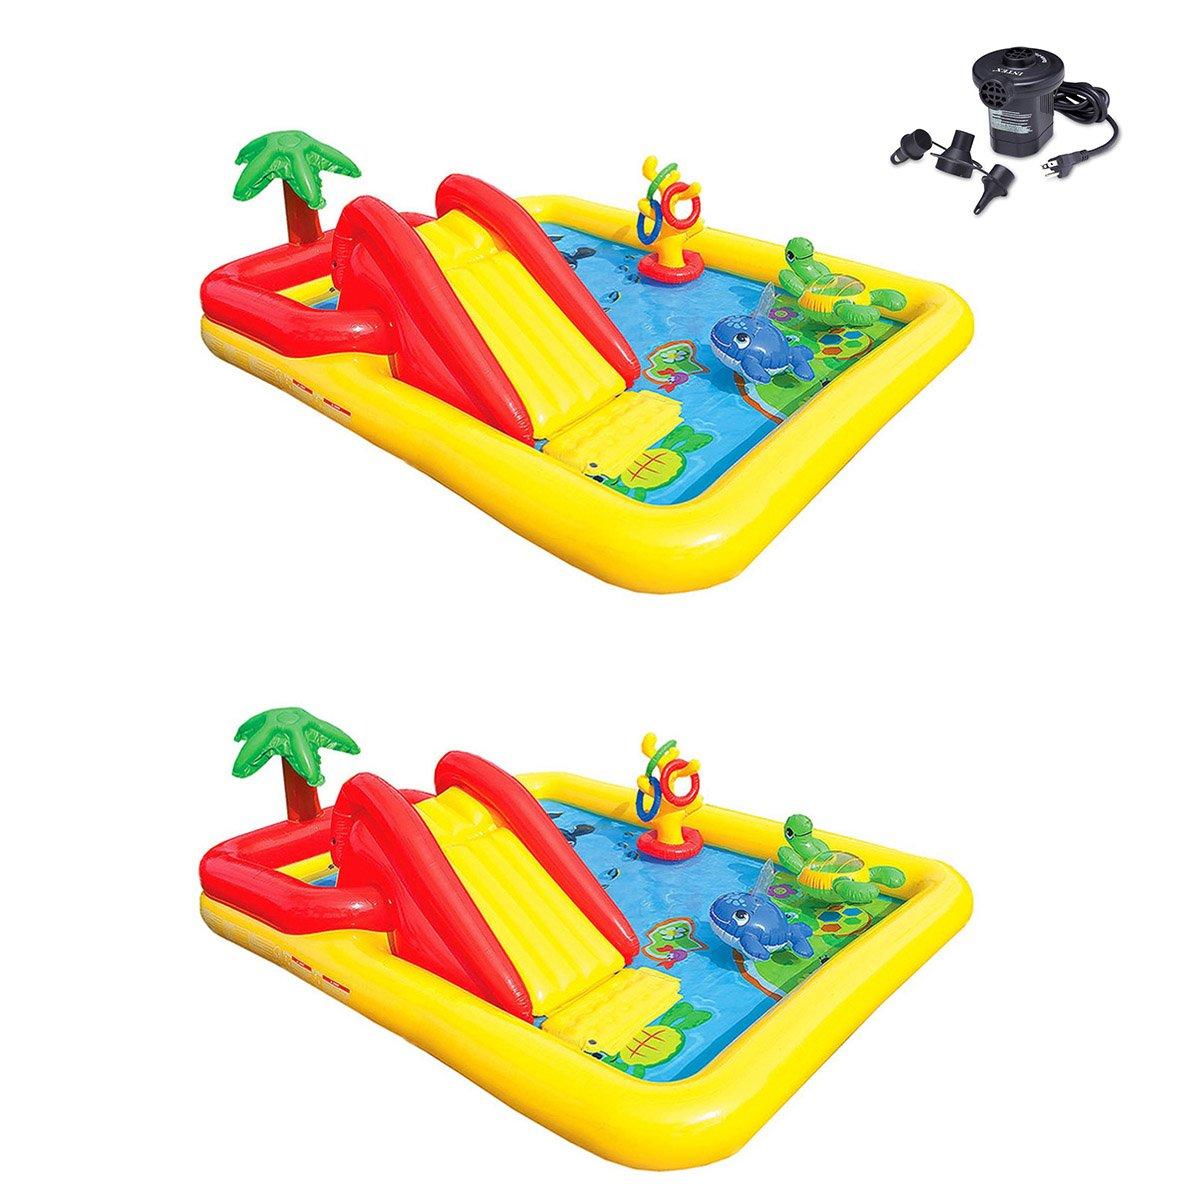 Intex Inflatable Ocean Play Center Kids Backyard Pool (2 Pack) + Air Pump by Intex (Image #1)